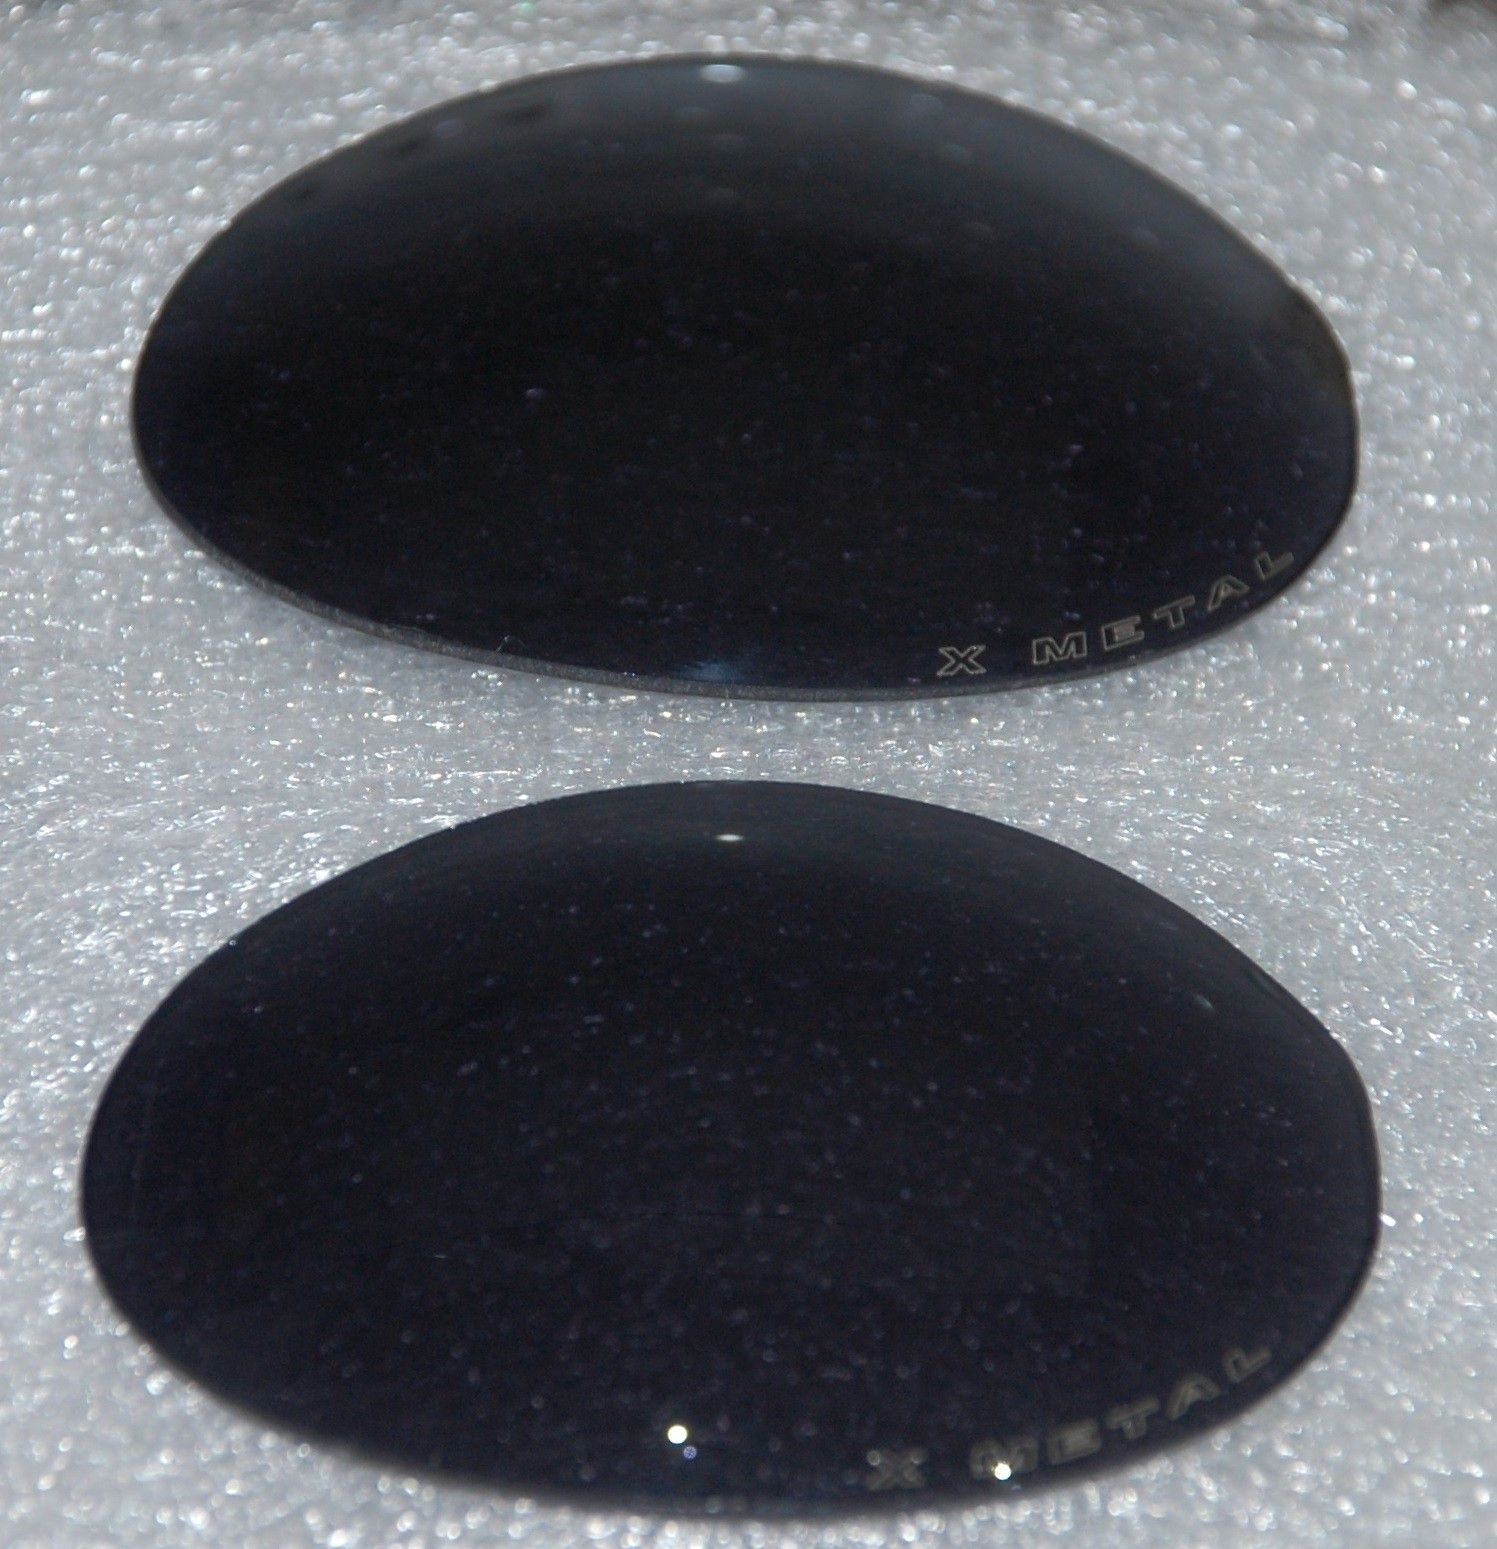 R1 Black Iridium lenses. Only left (the X-metal etched) side. - R1 Lenses3.jpg